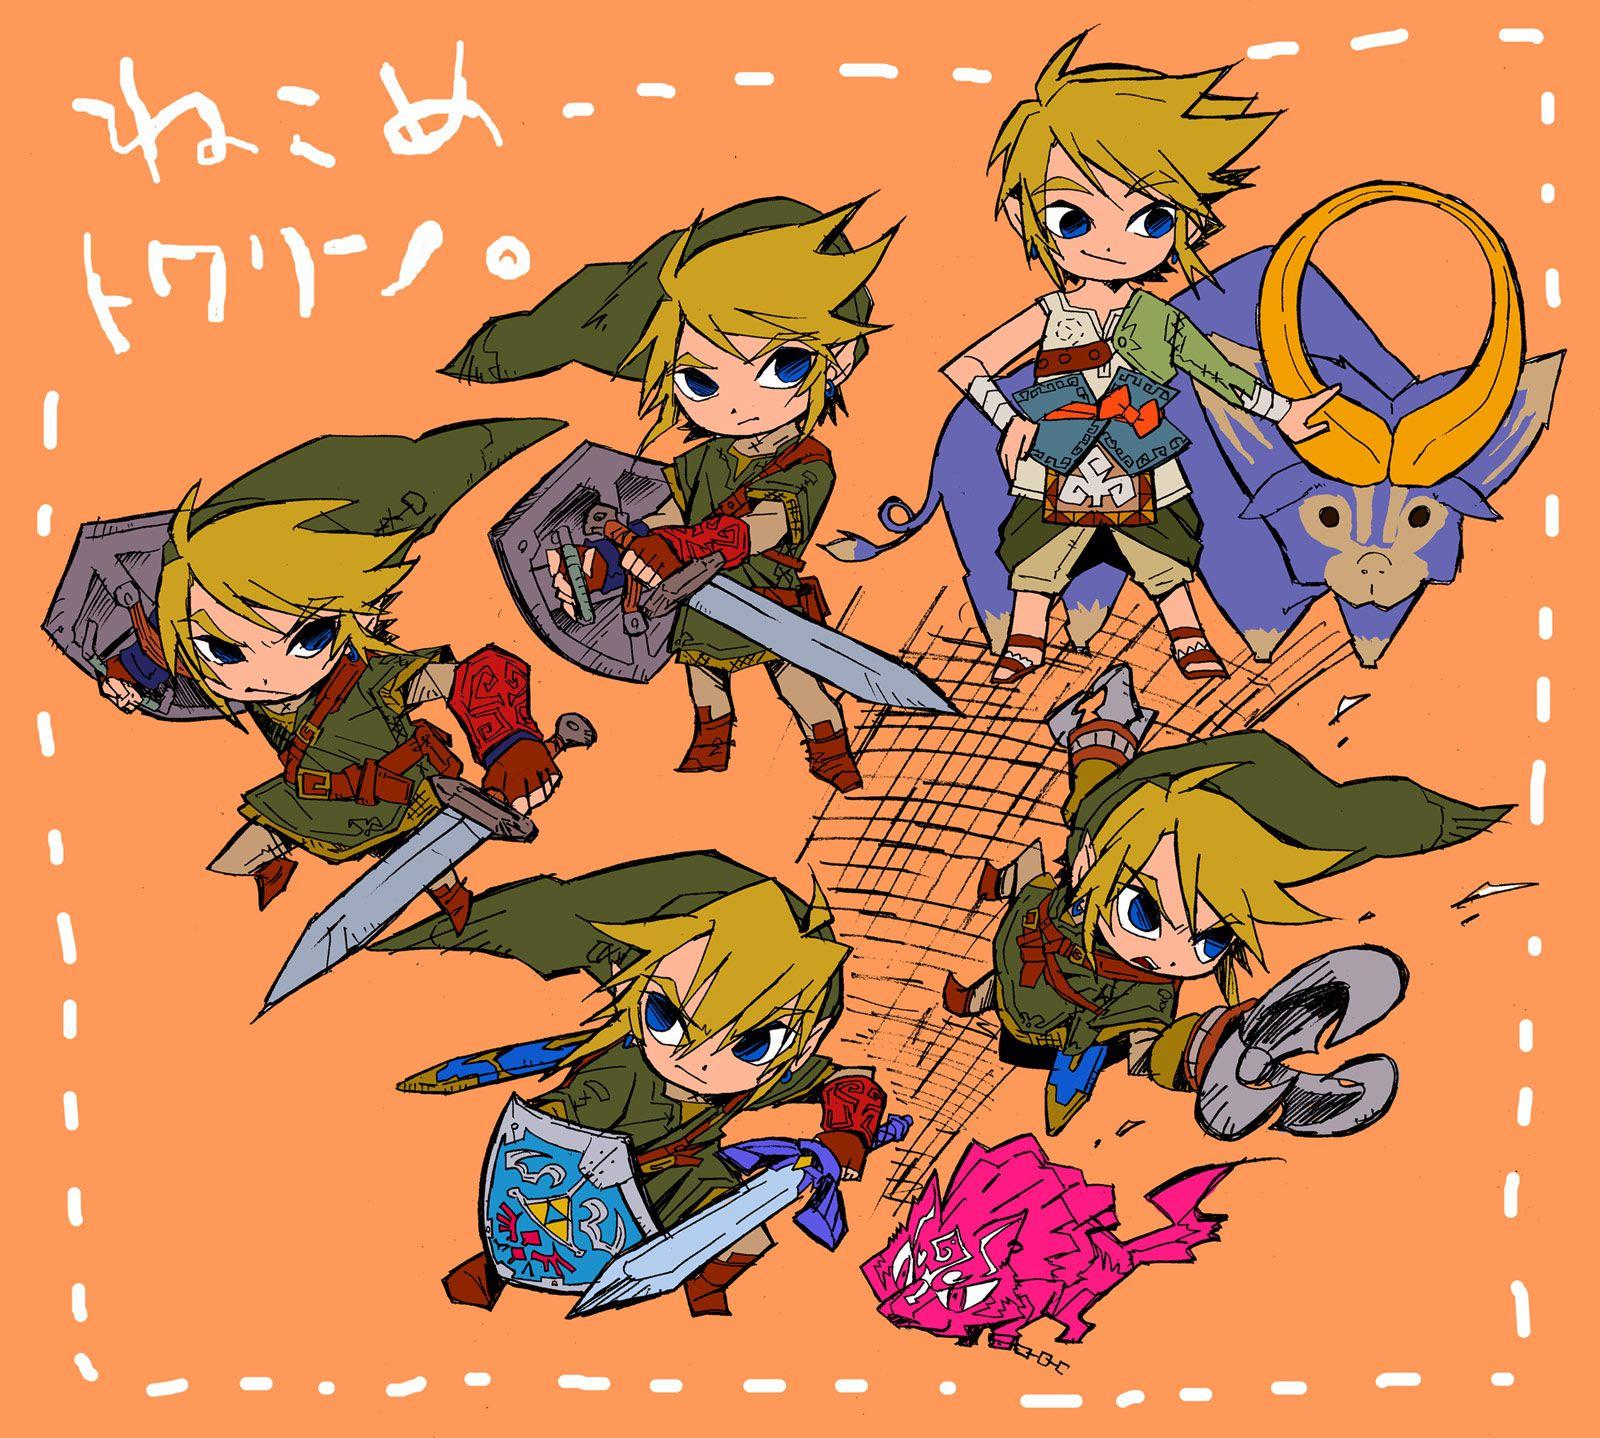 The Legend of Zelda: Twilight Princess / Link and an Ordon Goat / 「ゼルダの伝説ログ4」/「リクアキラ@ついった廃」の漫画 [pixiv] [24]